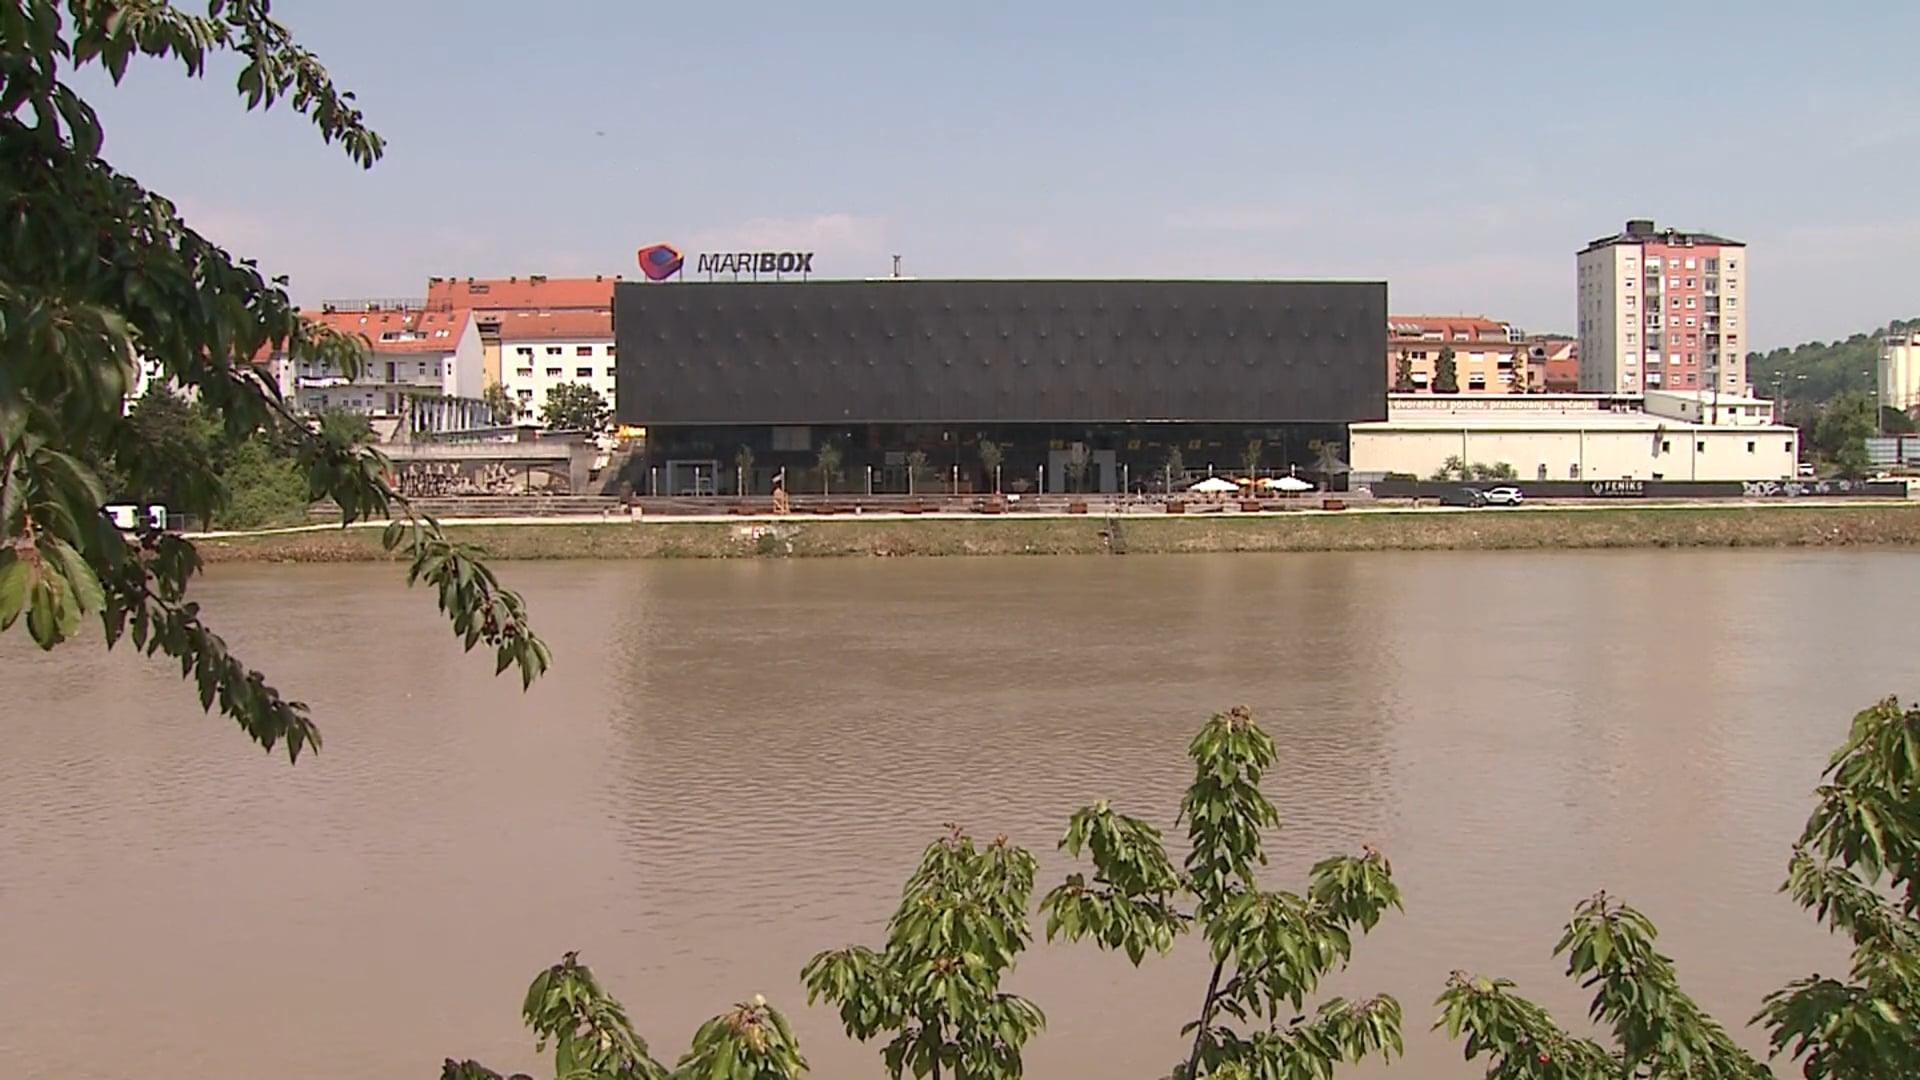 Mestna plaža v Mariboru